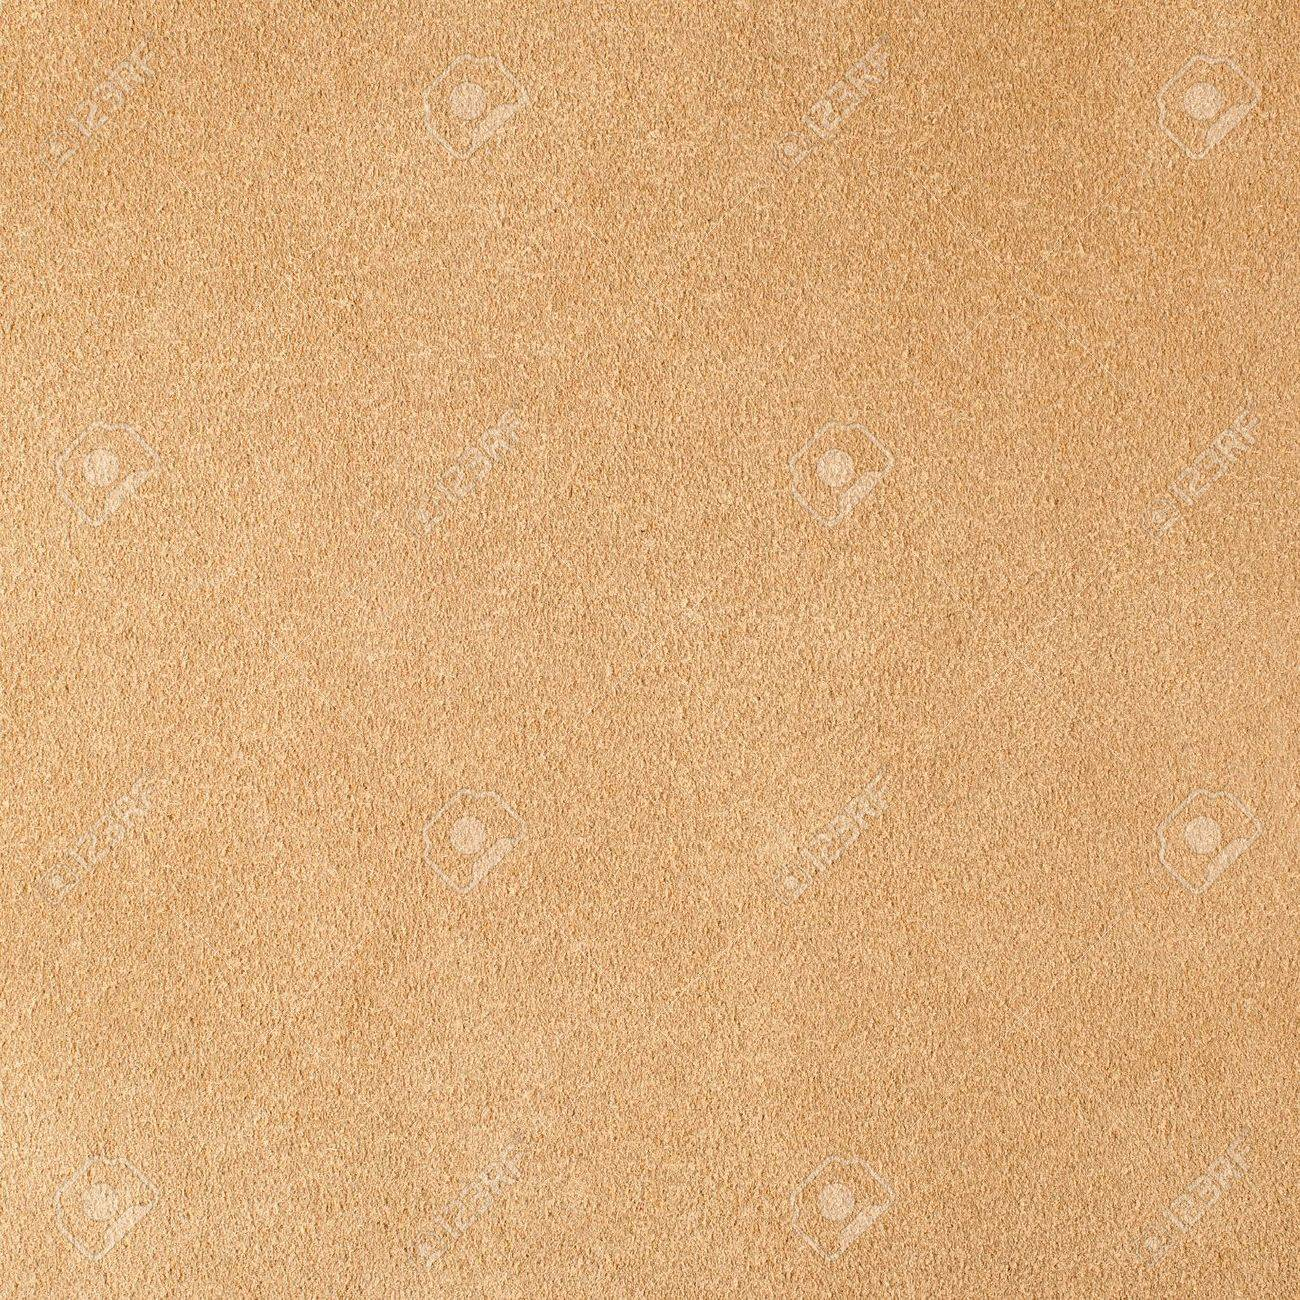 Brown suede closeup background. - 19081392